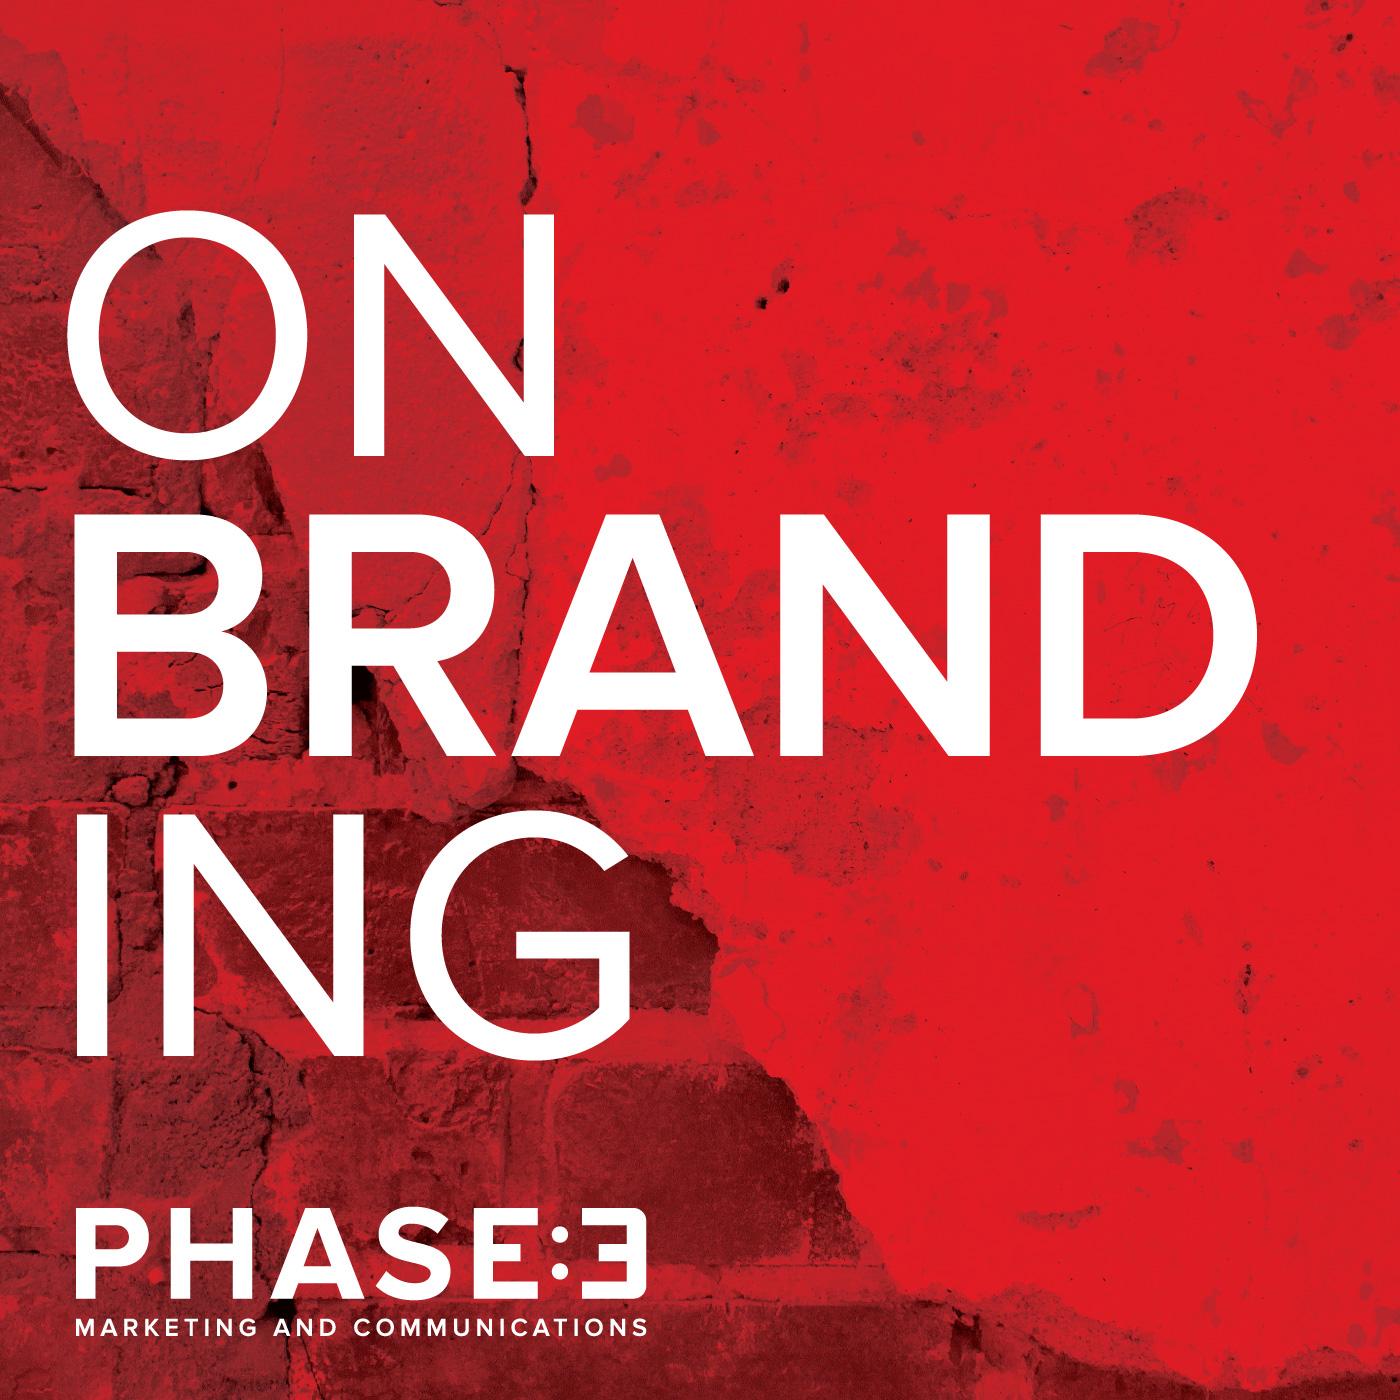 On Branding